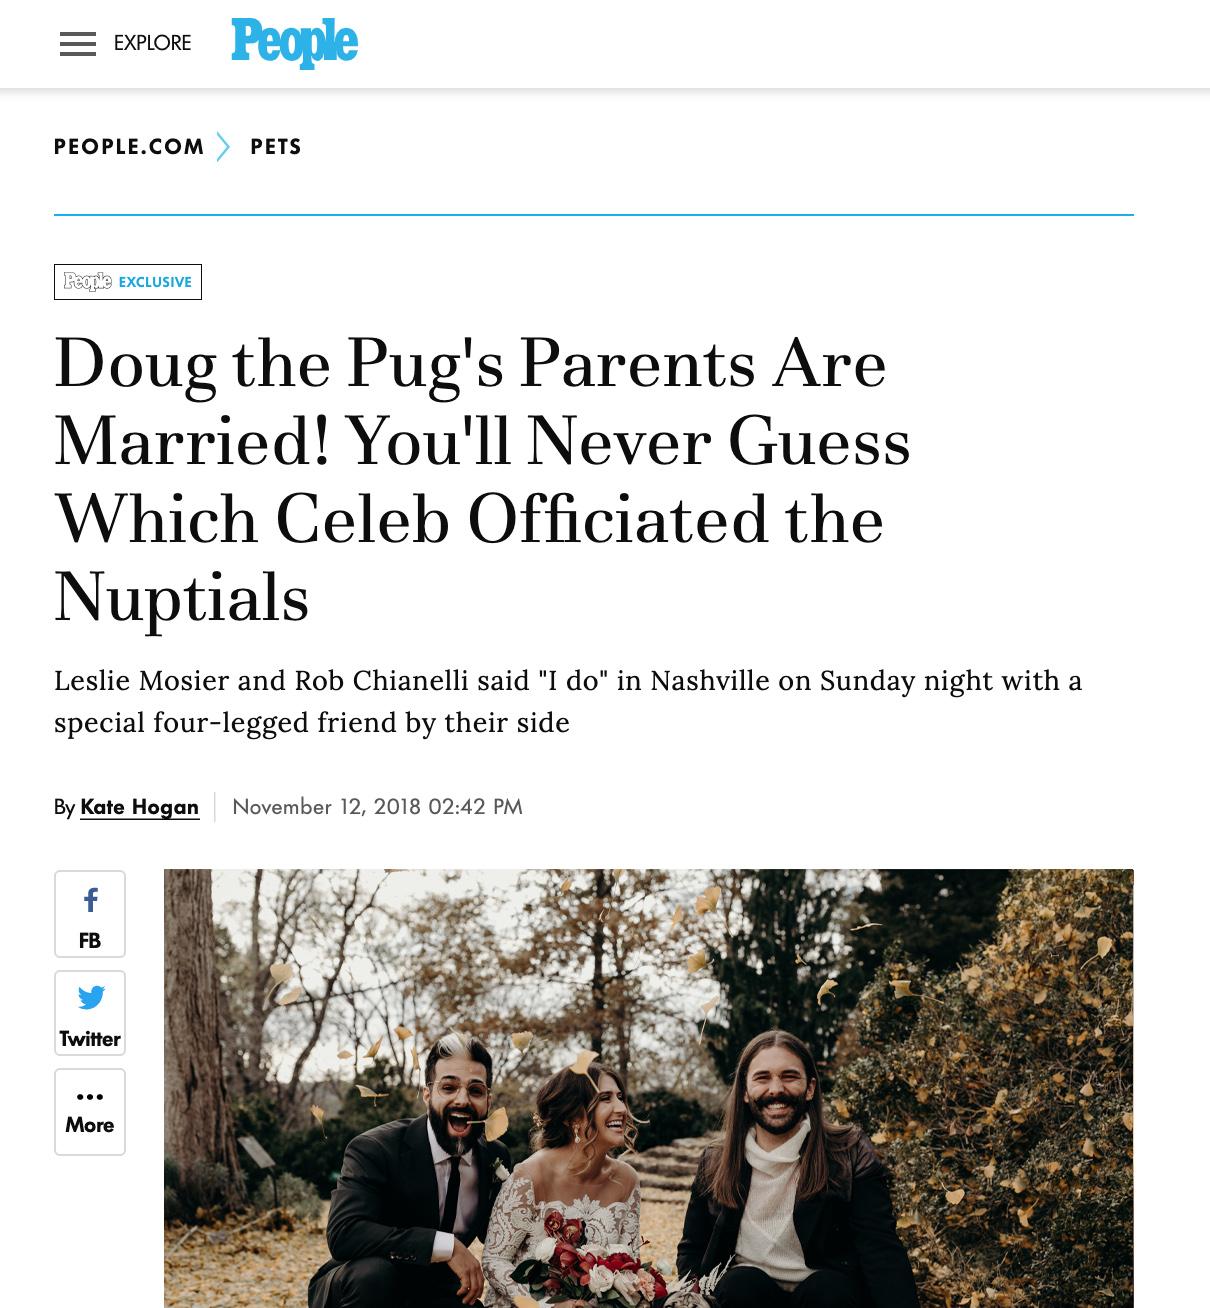 People.com - Leslie + Rob + It's Doug the Pug